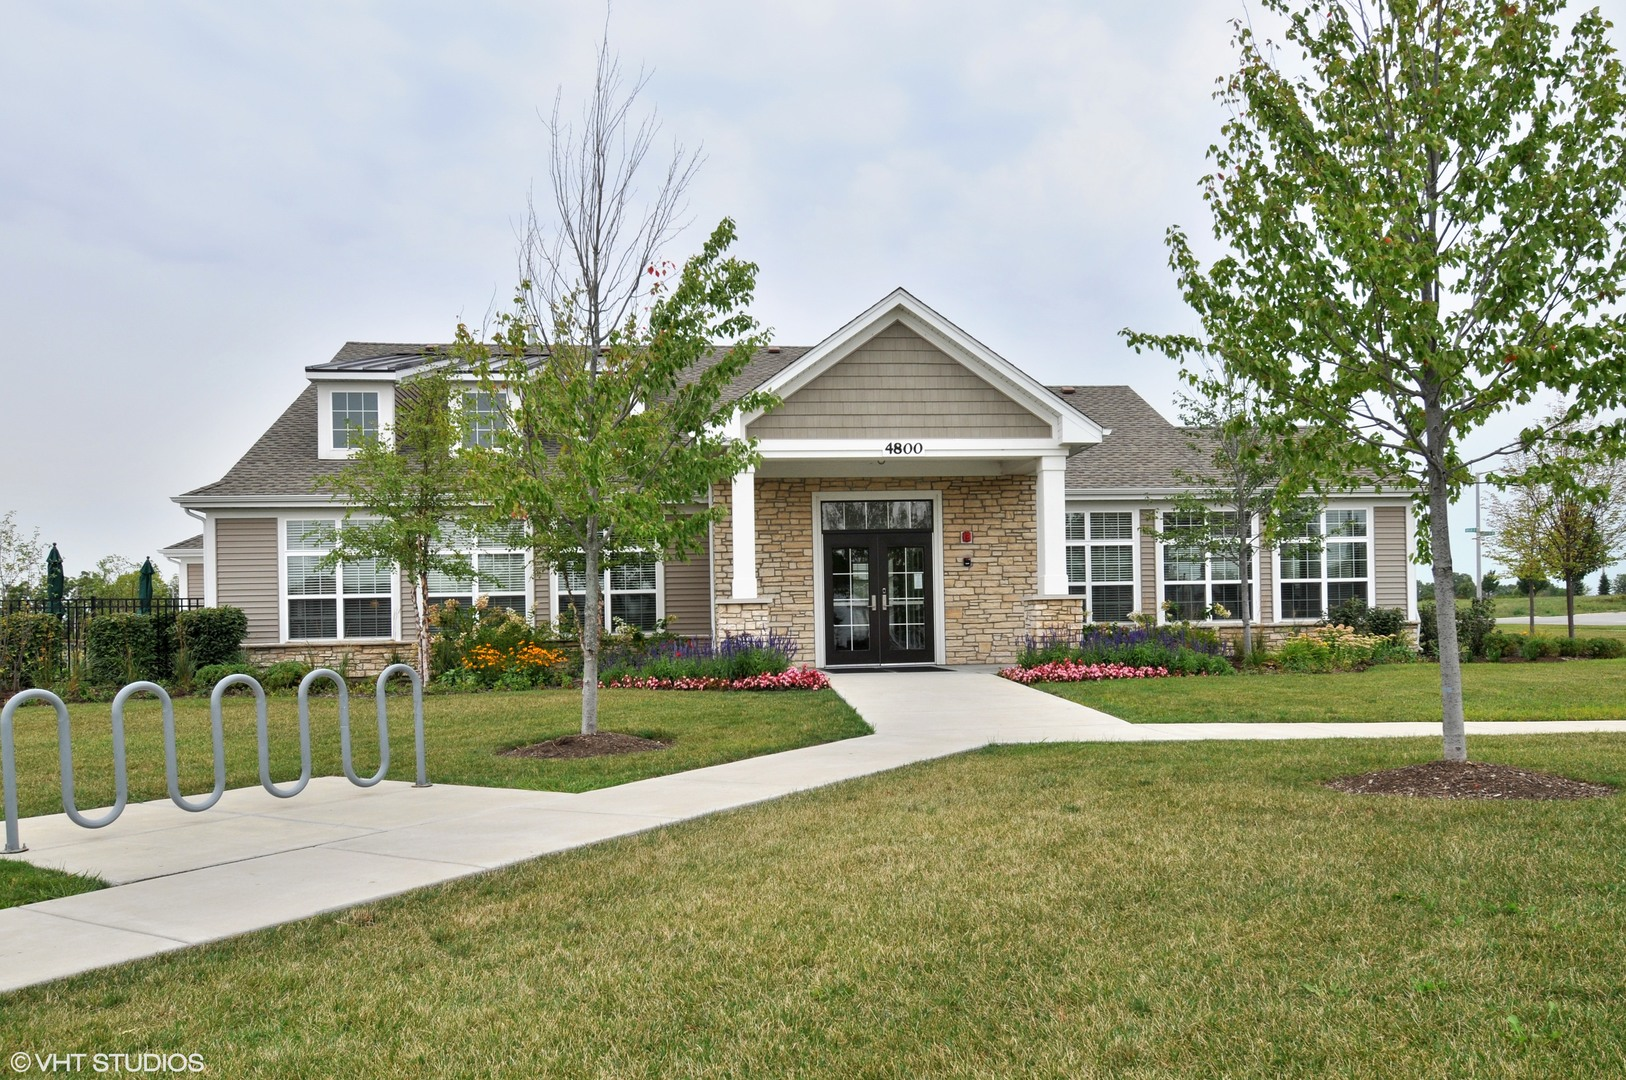 5004 Carpenter, Oswego, Illinois, 60543